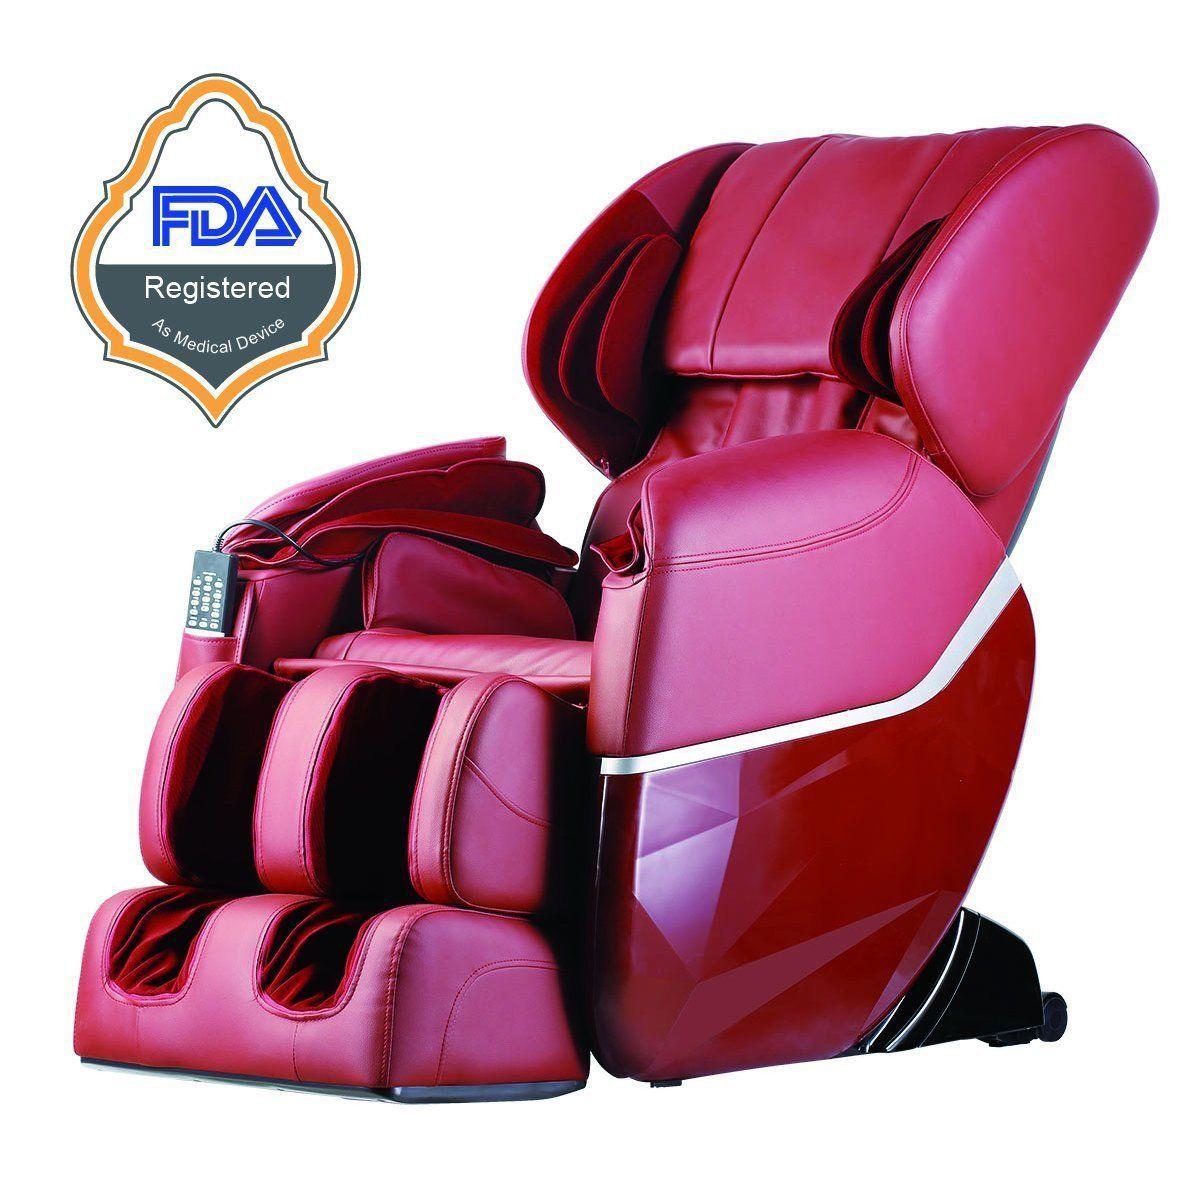 Details about New Electric Full Body Shiatsu Massage Chair